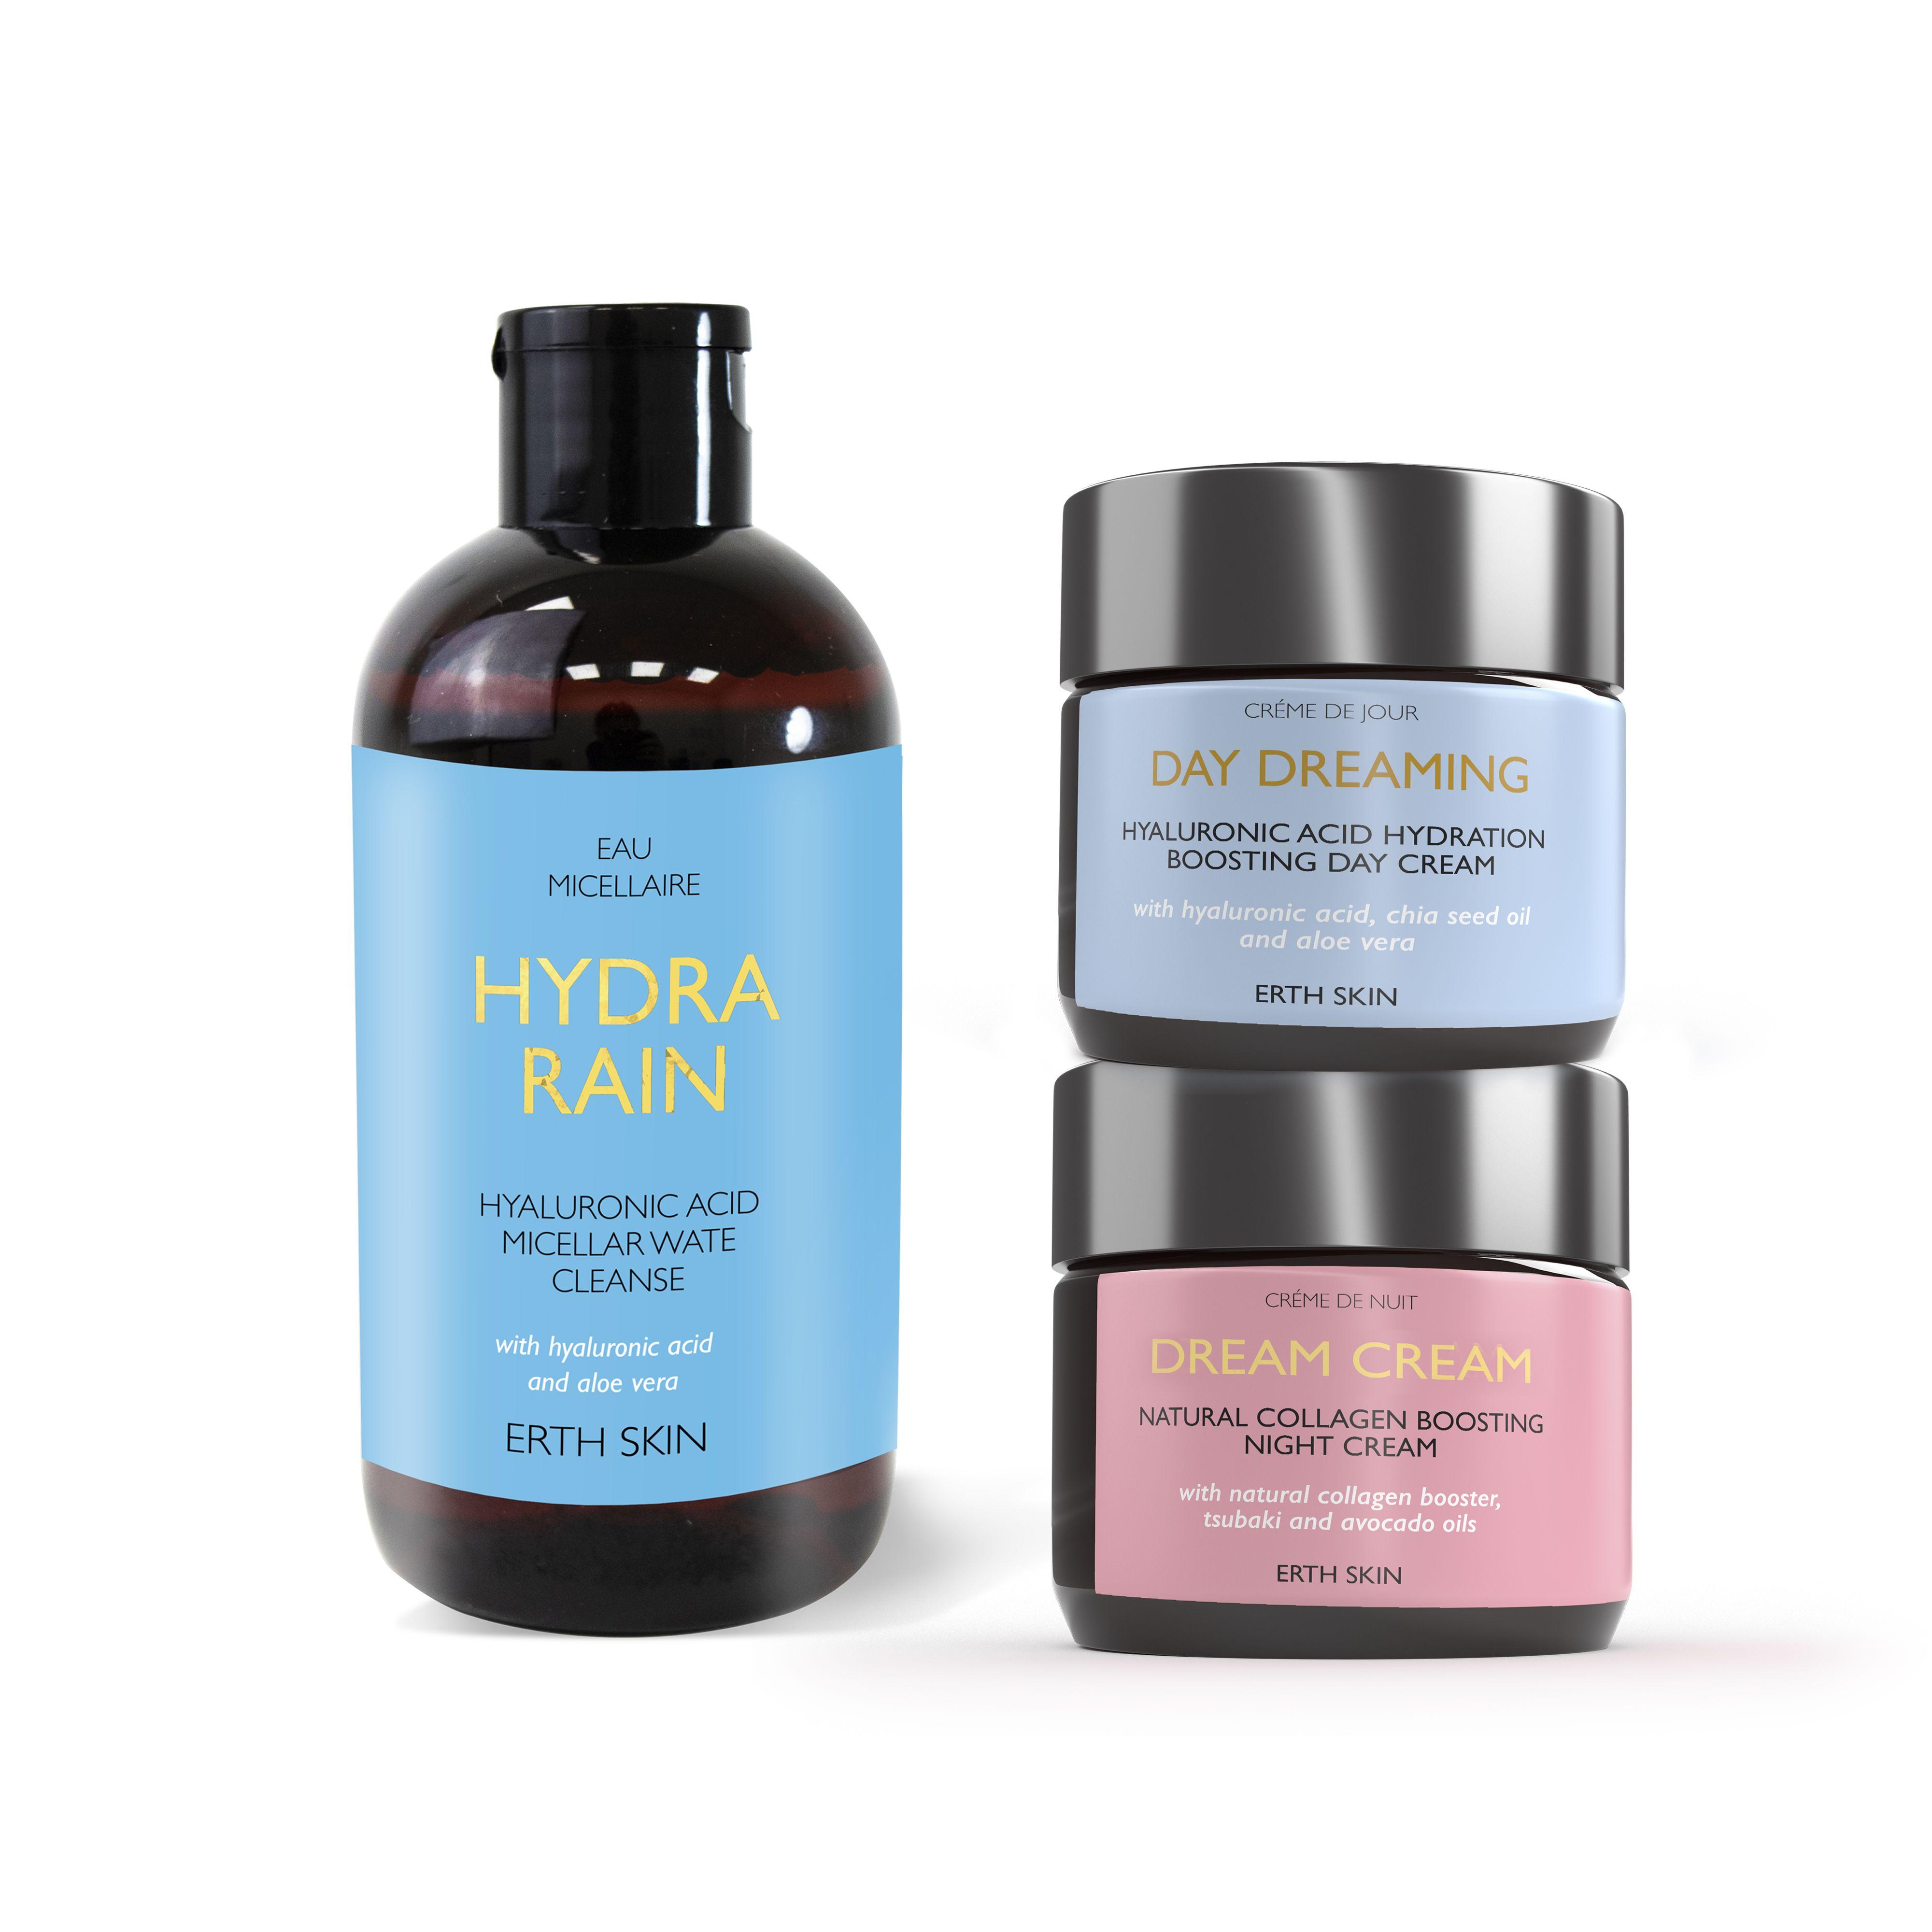 DAY DREAMING - day cream + DREAM CREAM - night cream+HYDRA RAIN - micellar cleansing water